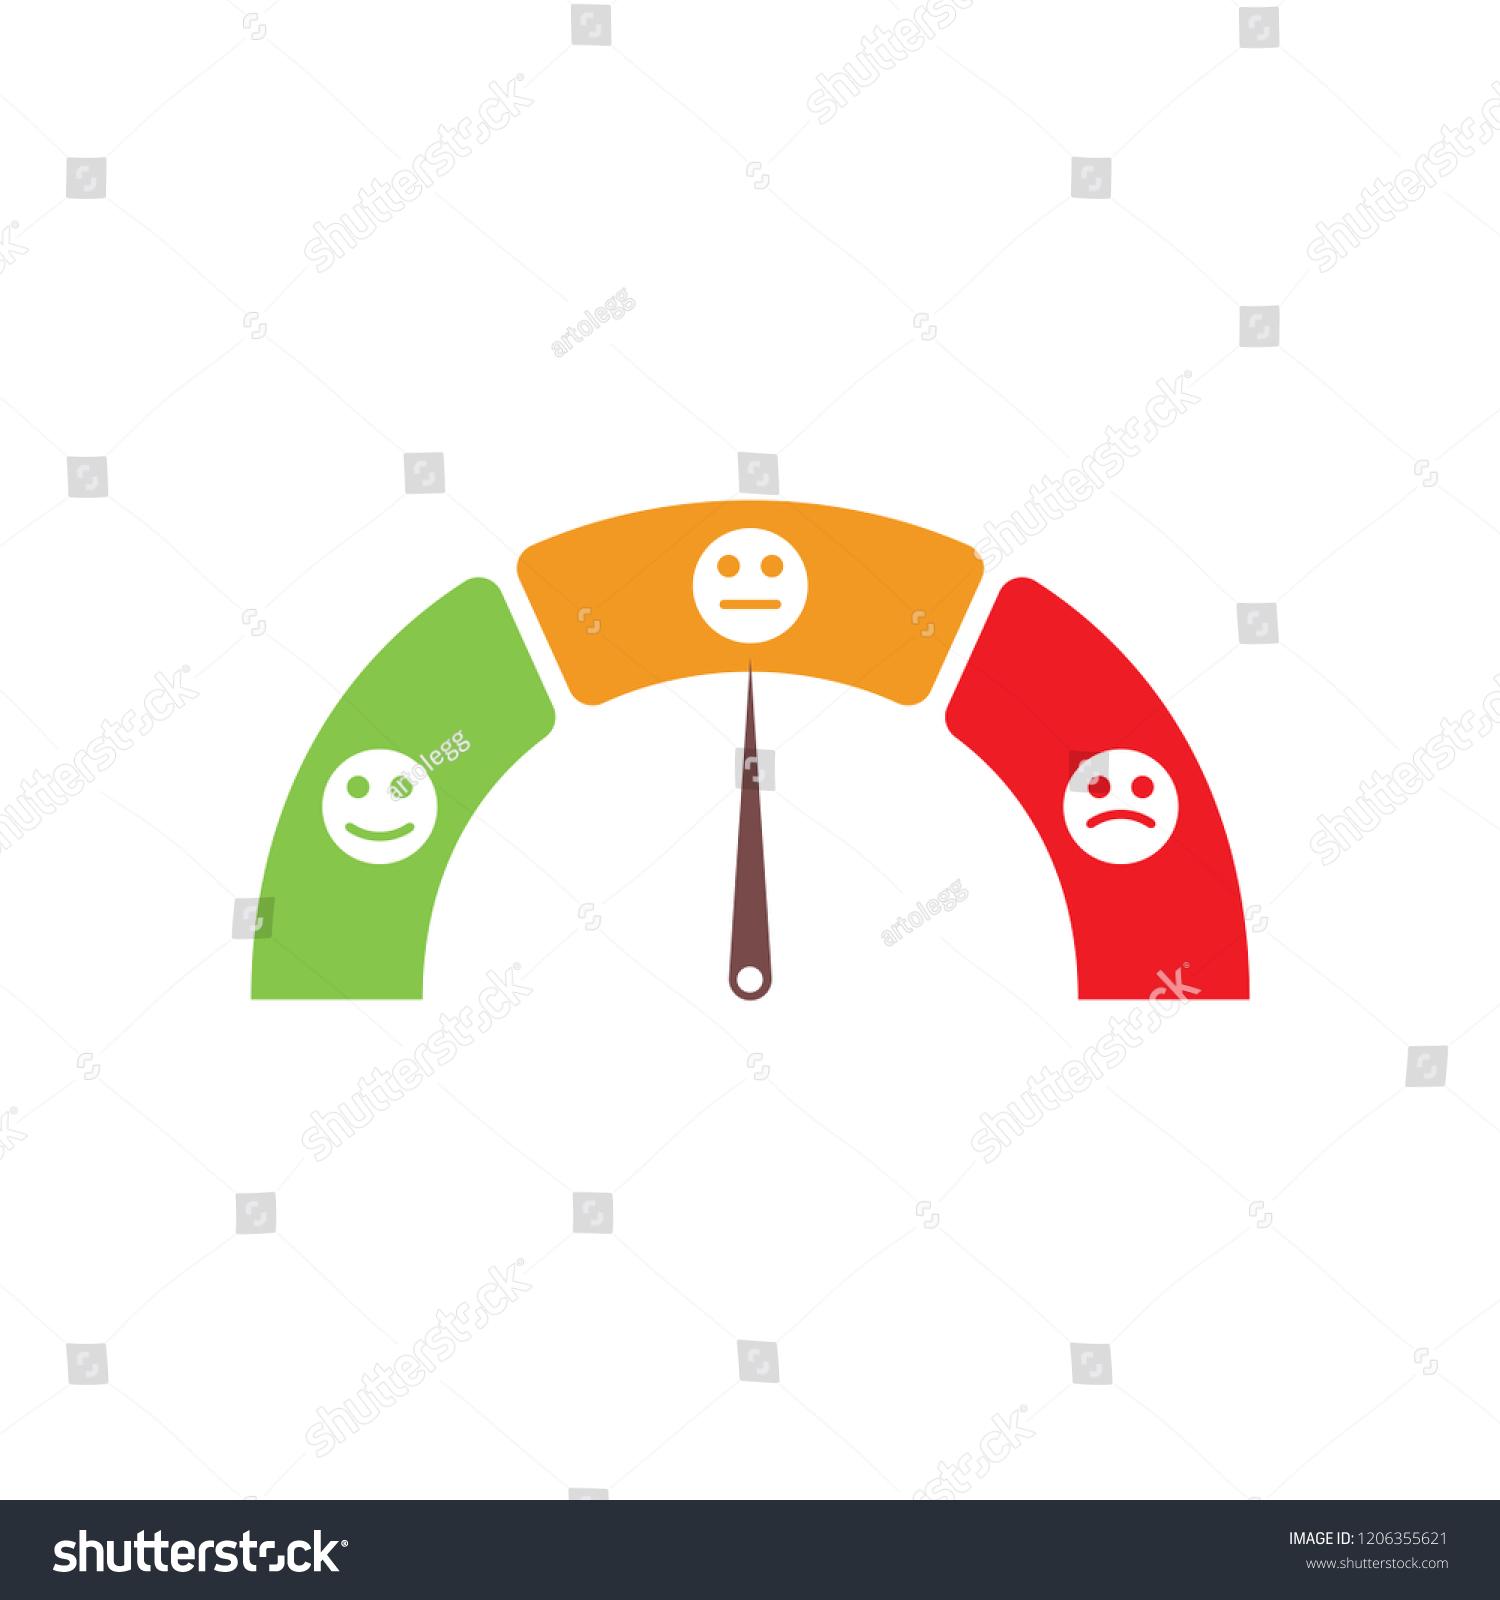 Keanu Jpg Mood Scale Wwwtollebildcom